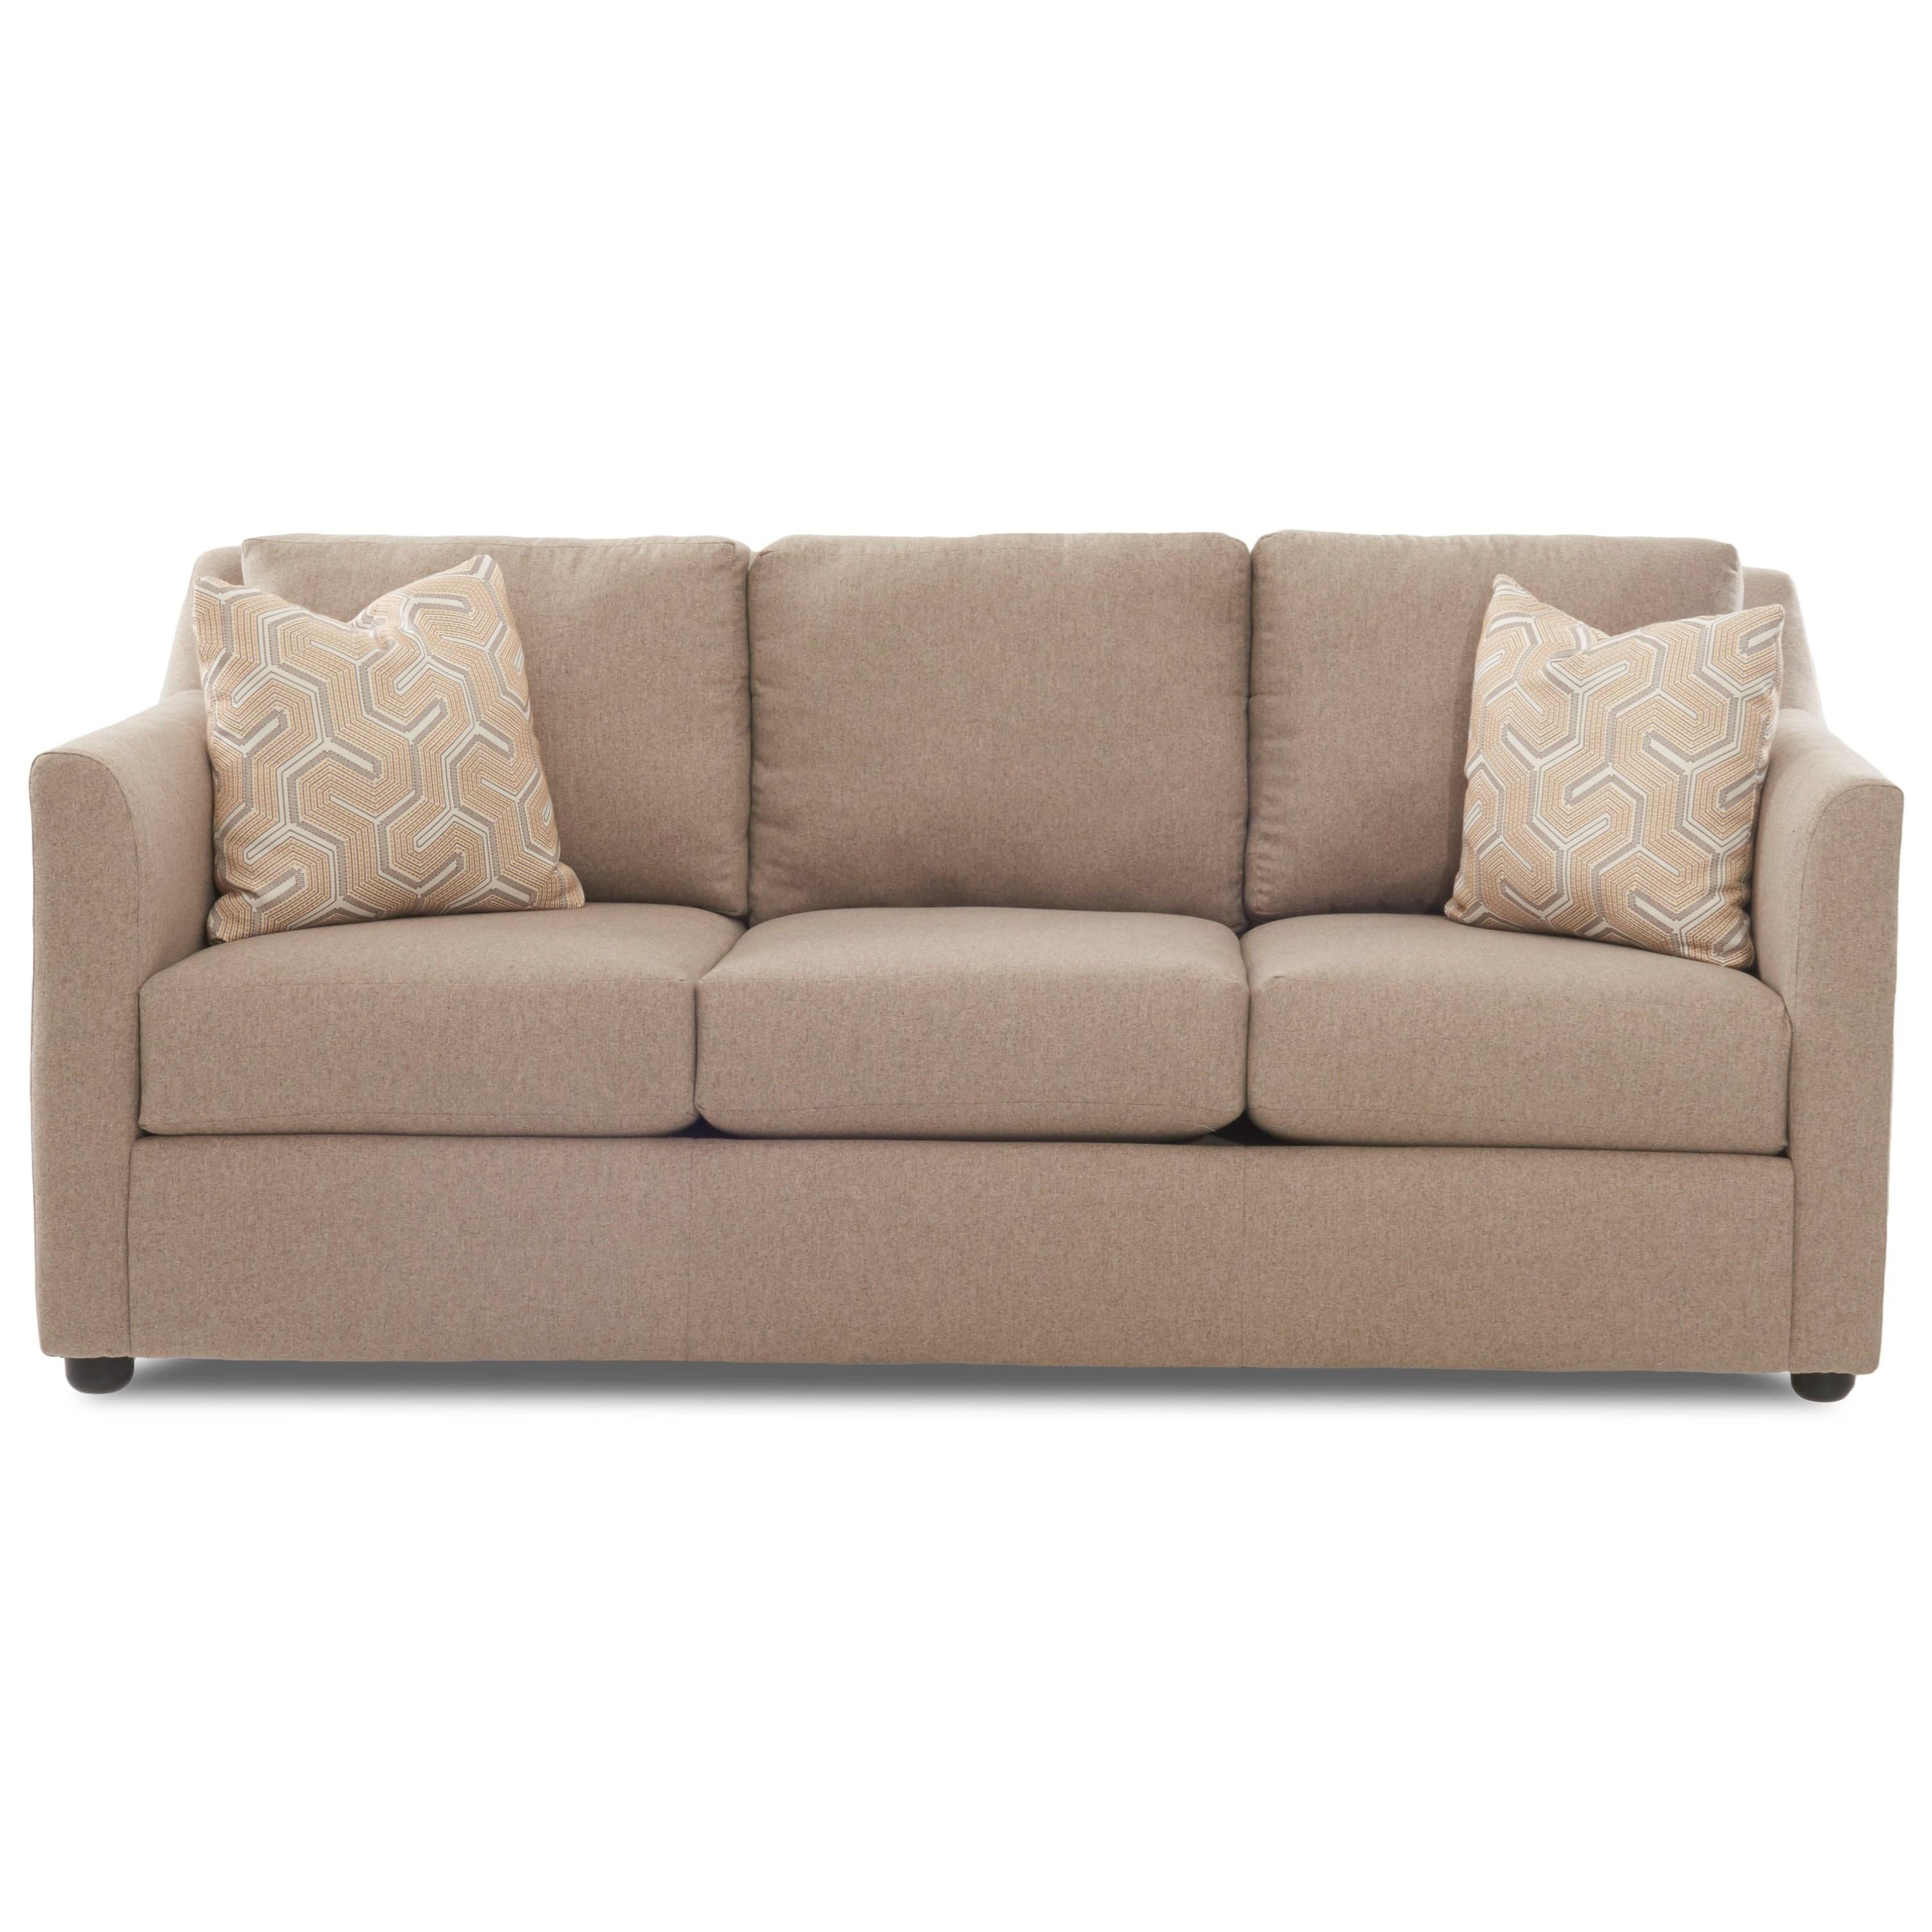 Enso Memory Foam Queen Sofa Sleeper